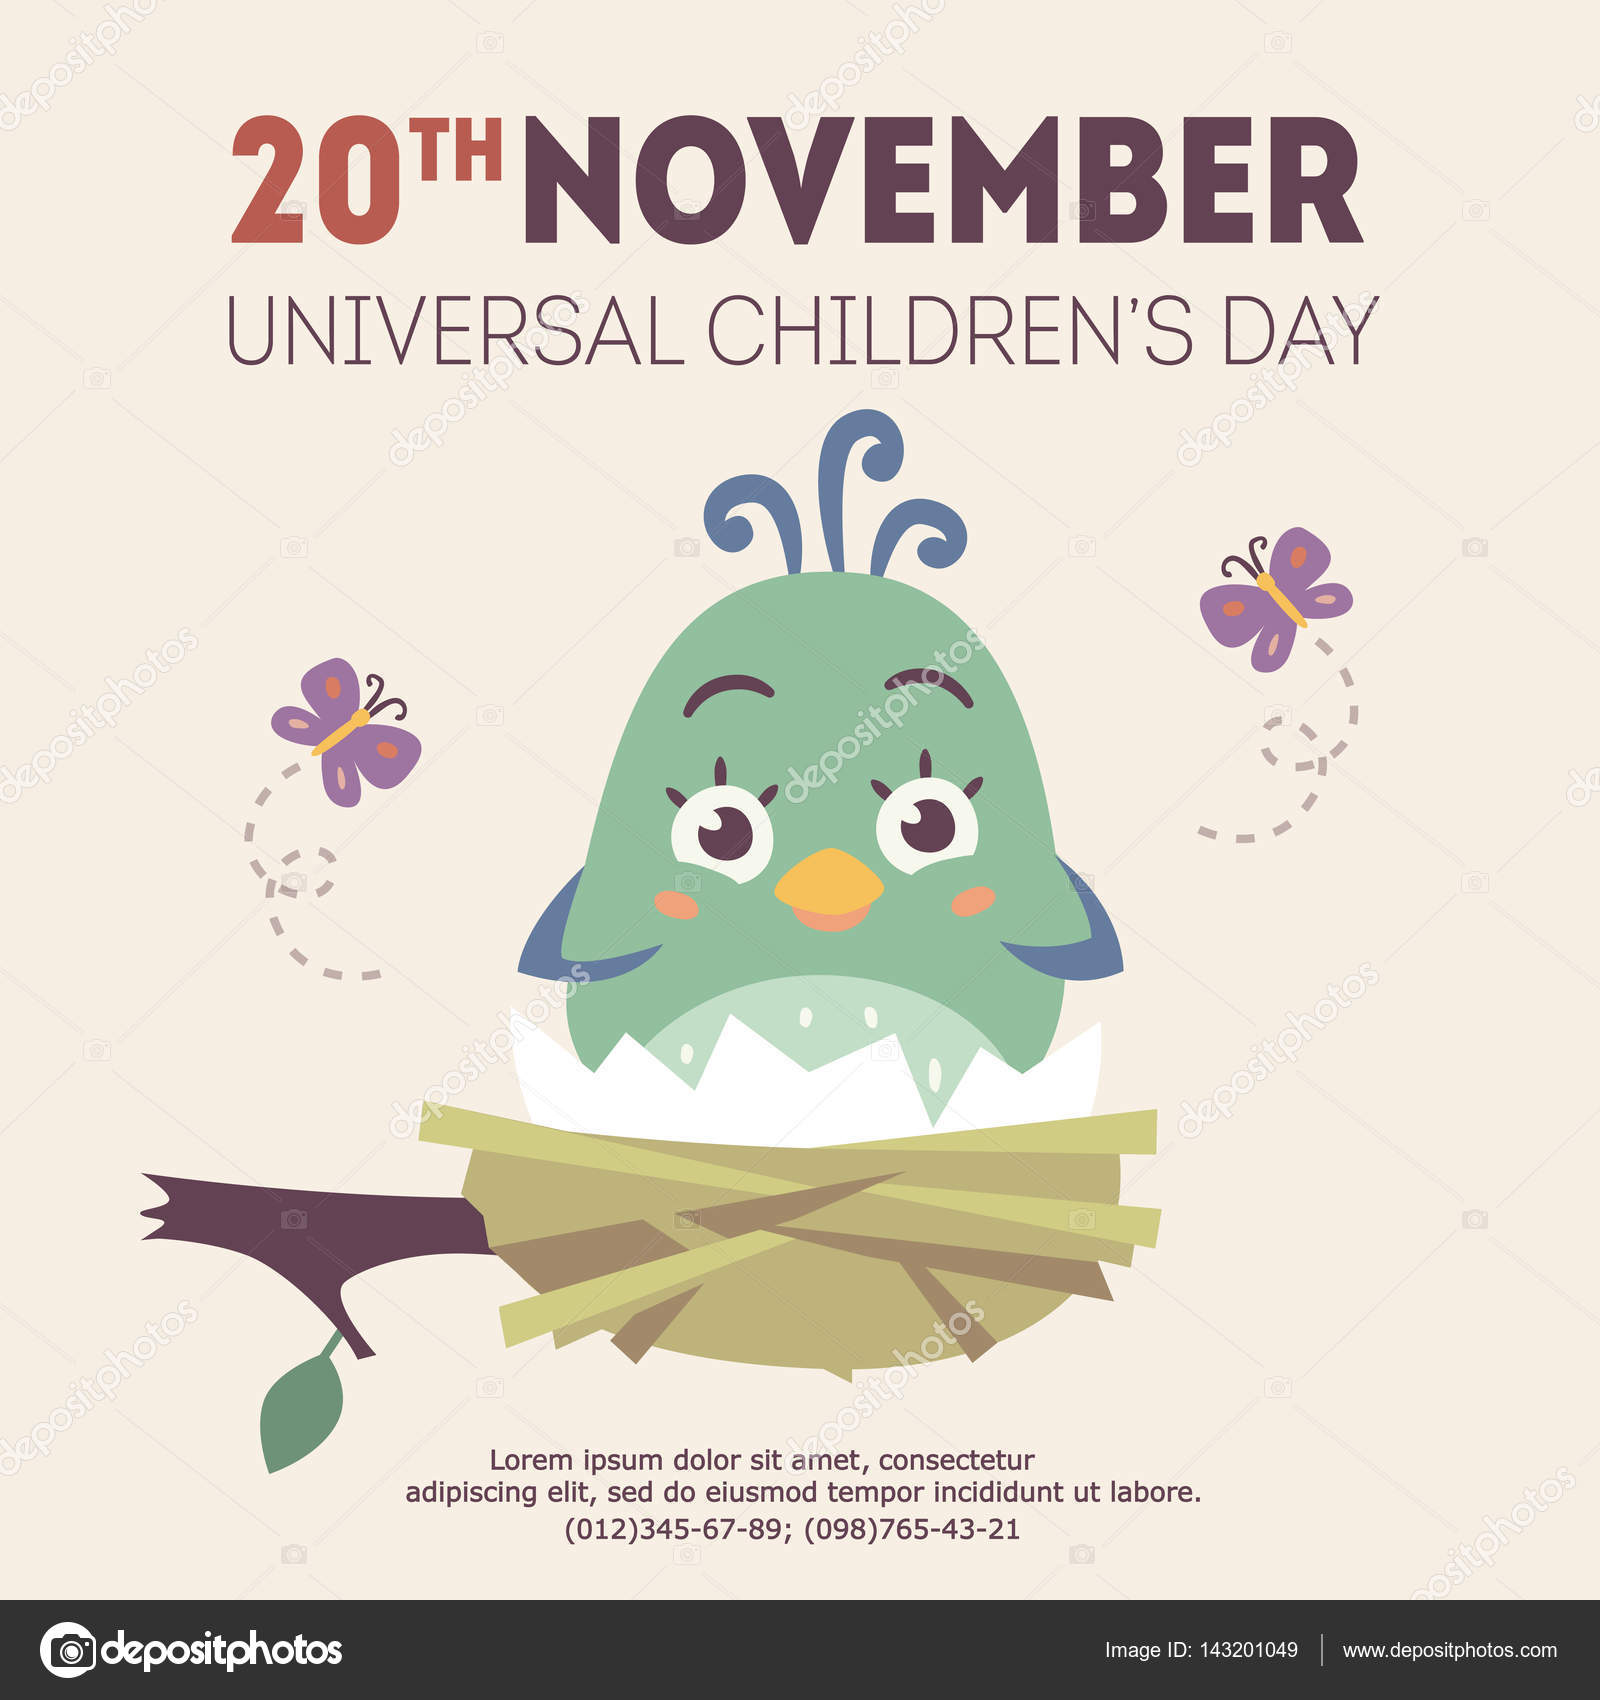 International Children's Day Theme